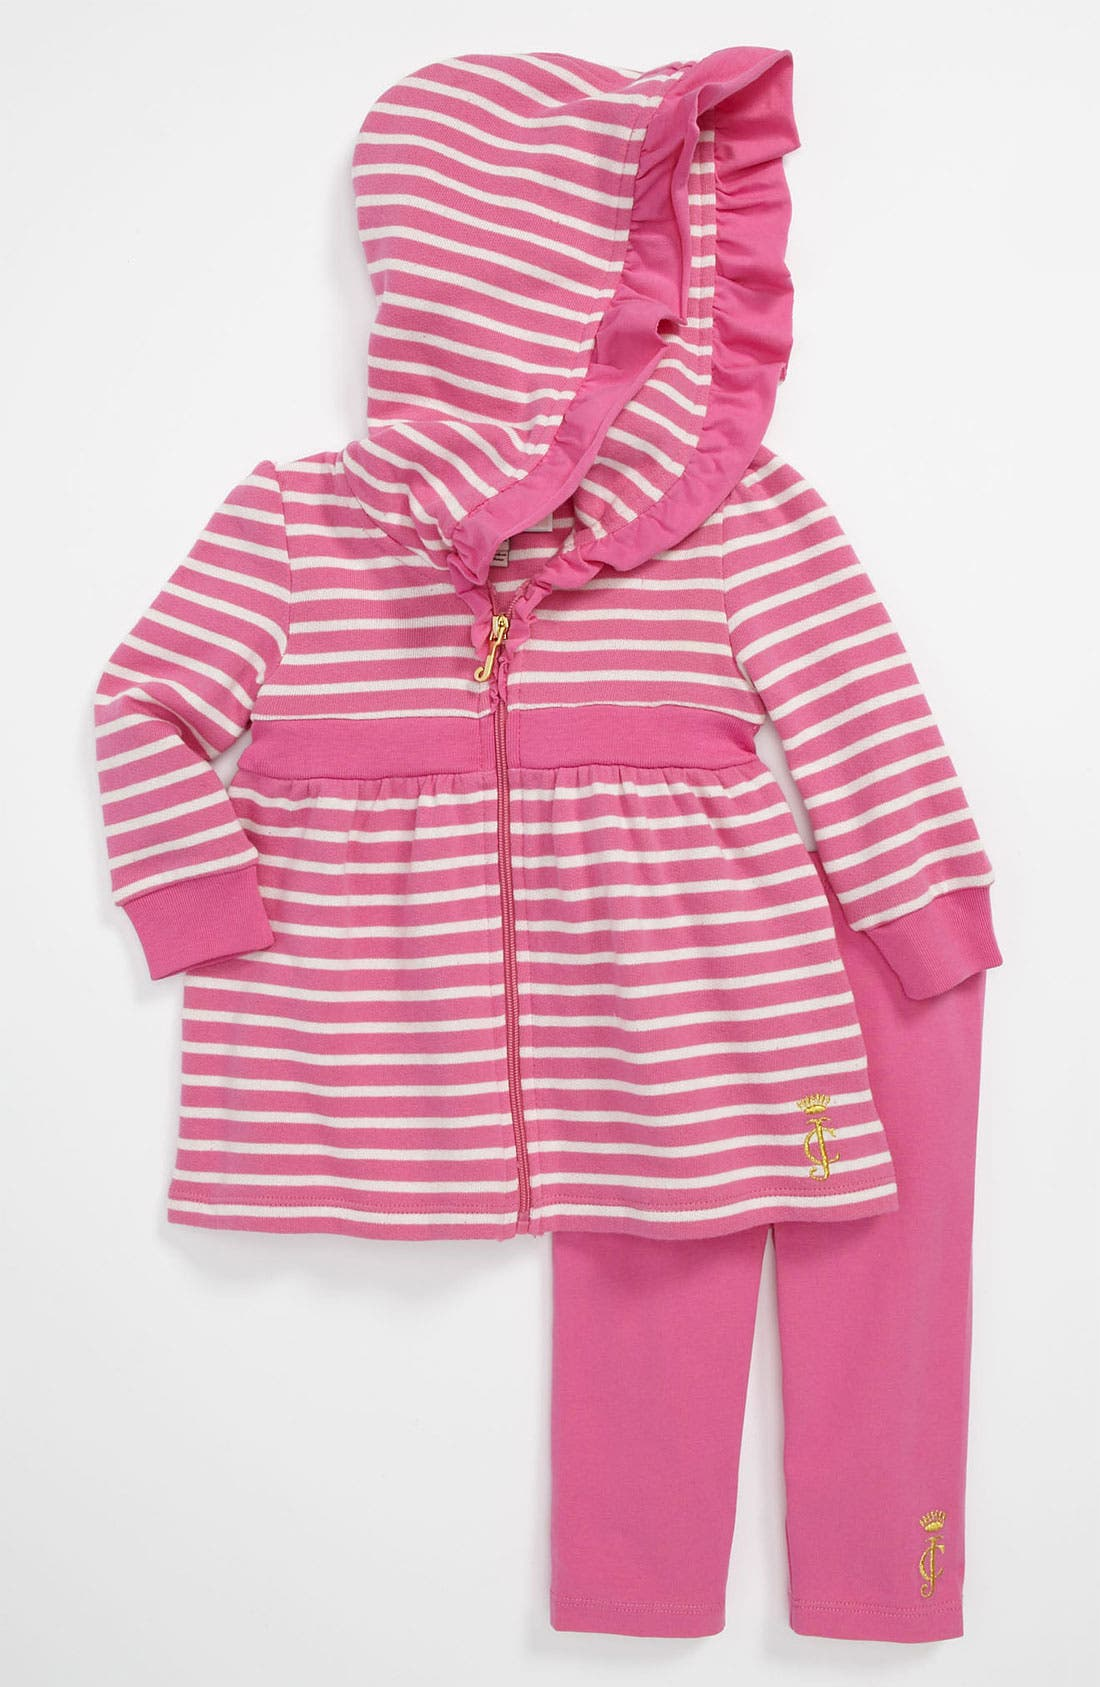 Alternate Image 1 Selected - Juicy Couture Hooded Cardigan & Leggings (Infant)